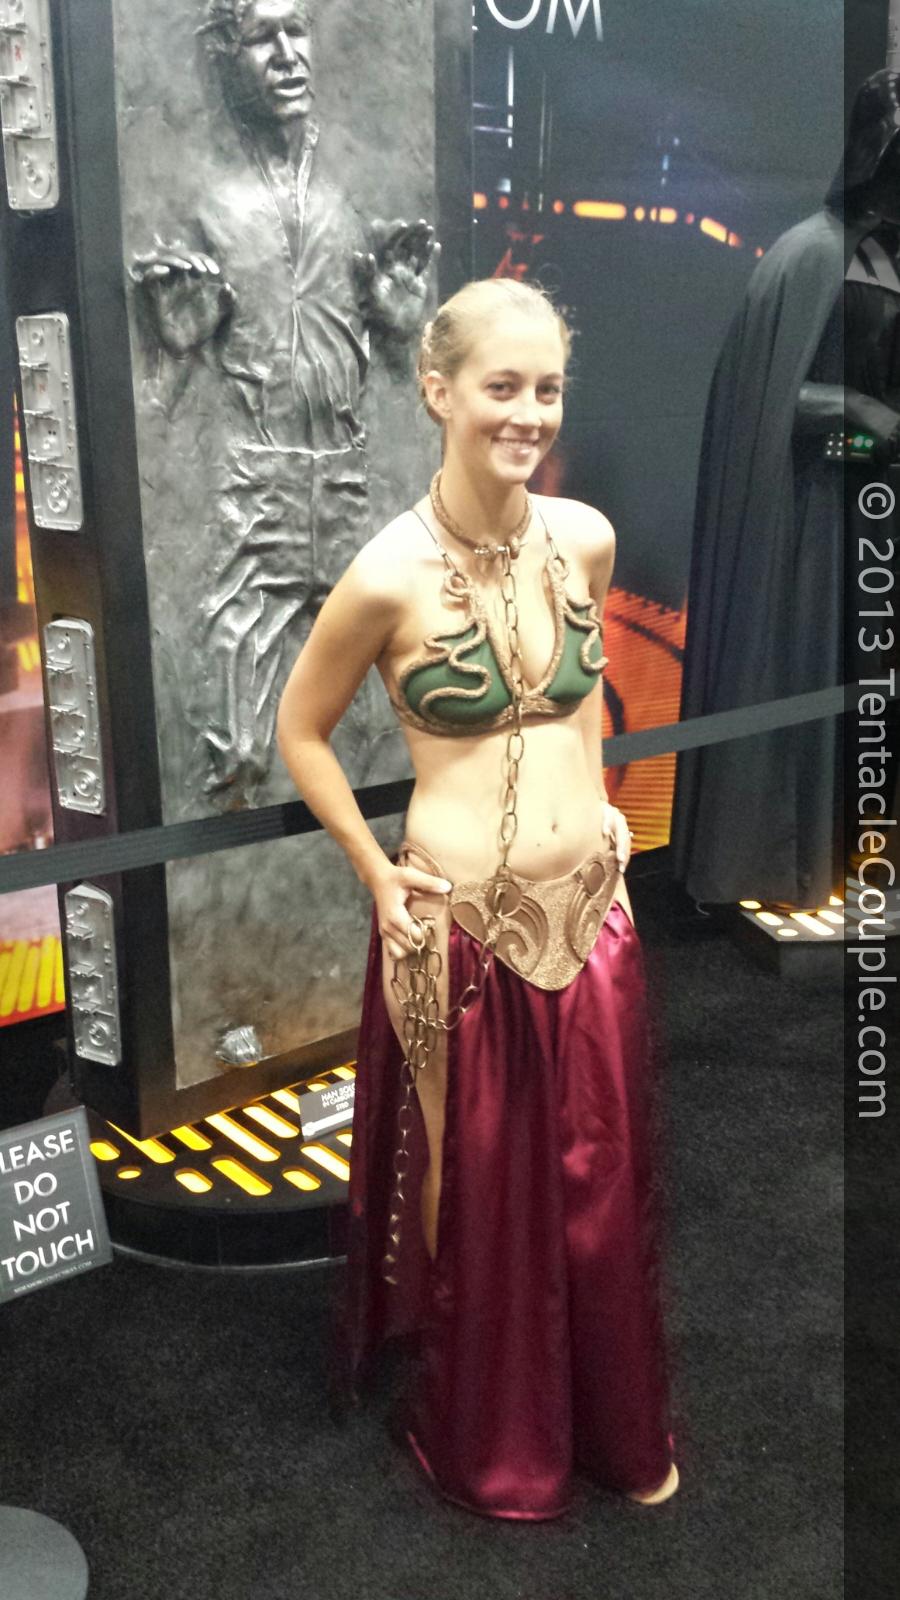 San Diego Comic-Con 2013 - Princess Leia